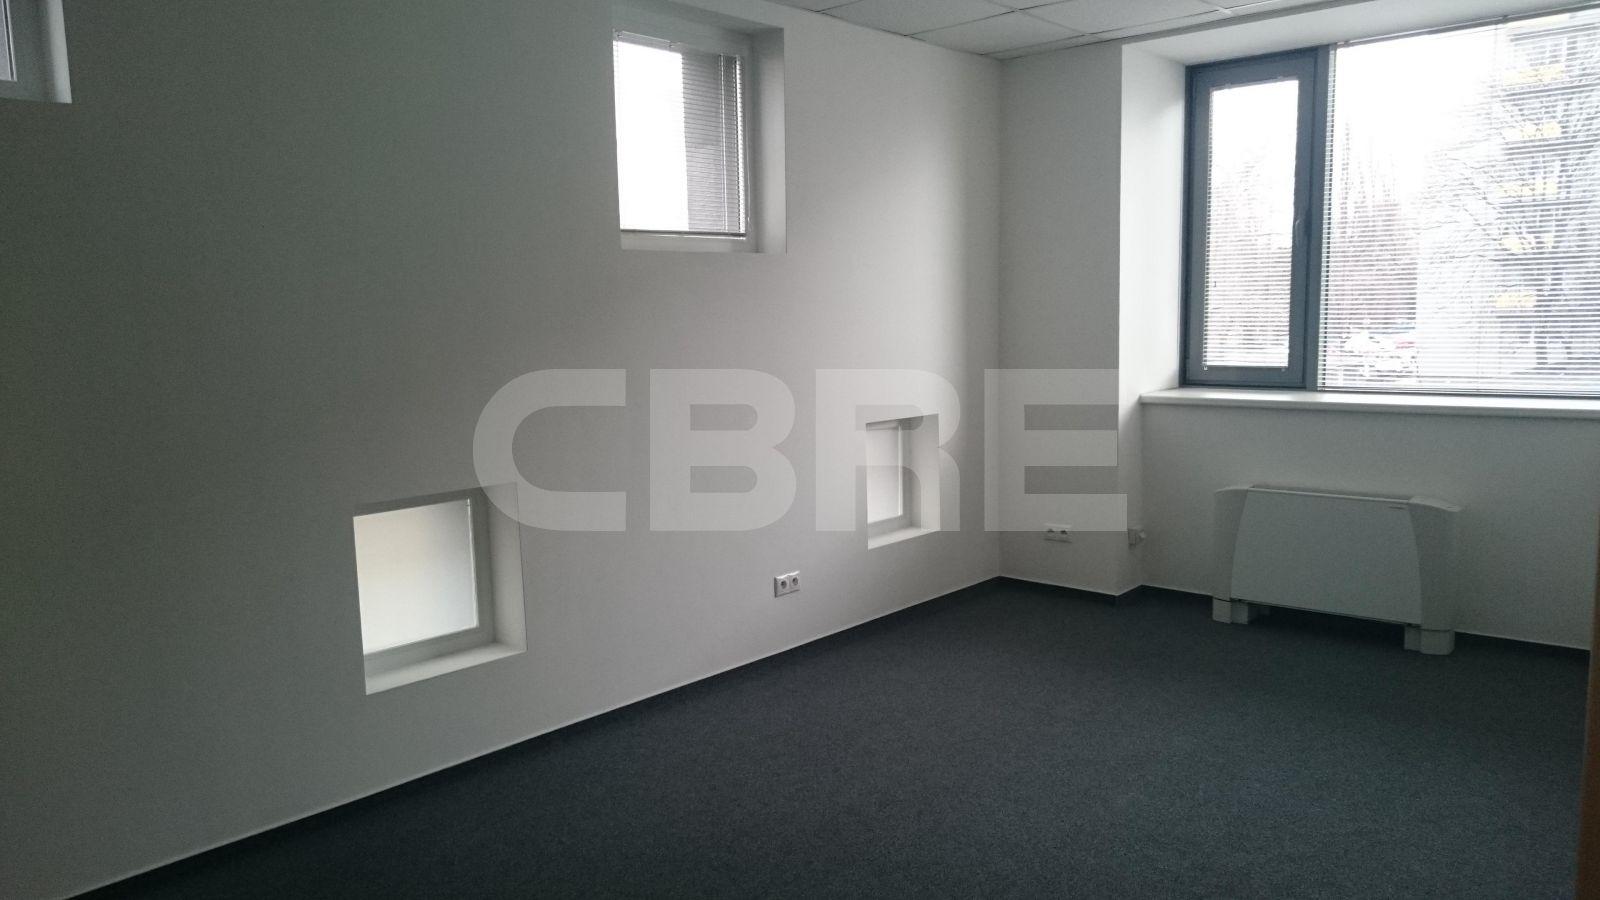 Aston - Bajkalská 22, Bratislava - Ružinov | Offices for rent by CBRE | 1